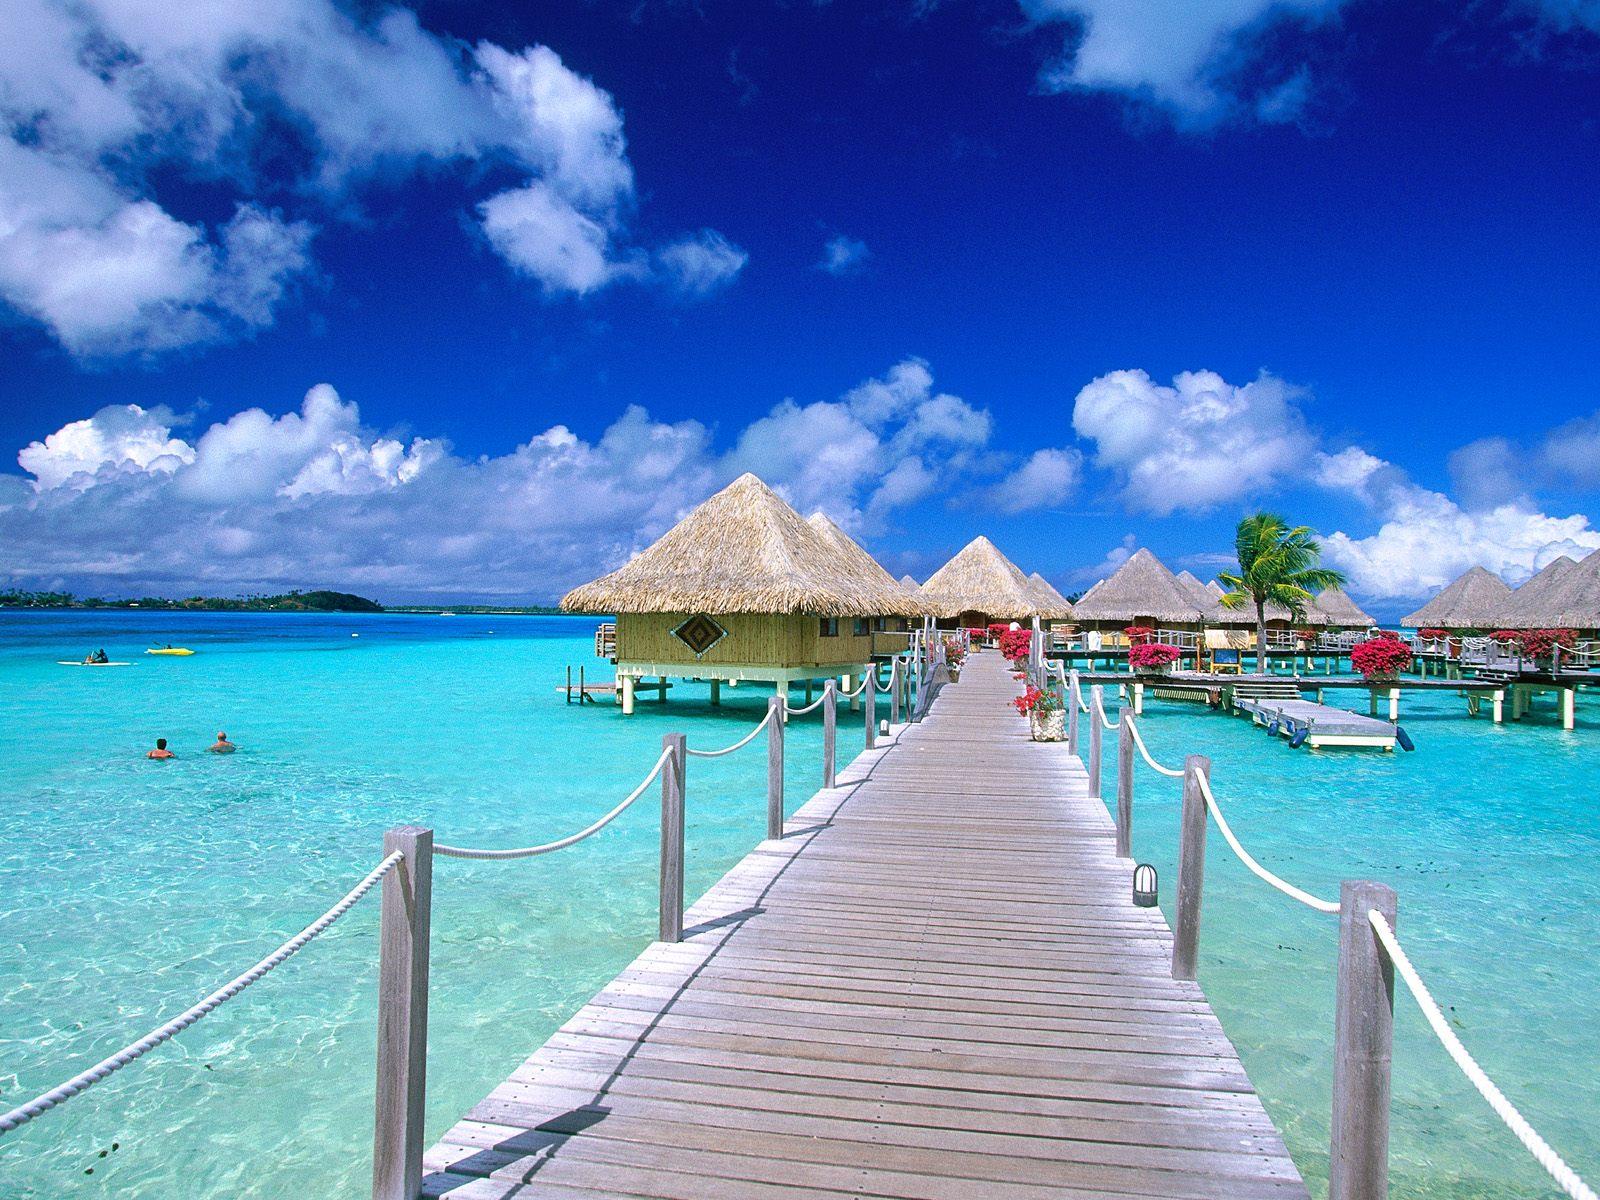 http://1.bp.blogspot.com/-RQ3C6Va28nY/Te5JpadaYDI/AAAAAAAAABg/Oivthow4Bzc/s1600/Matira_Point__Bora_Bora__French_Polynesia.jpg